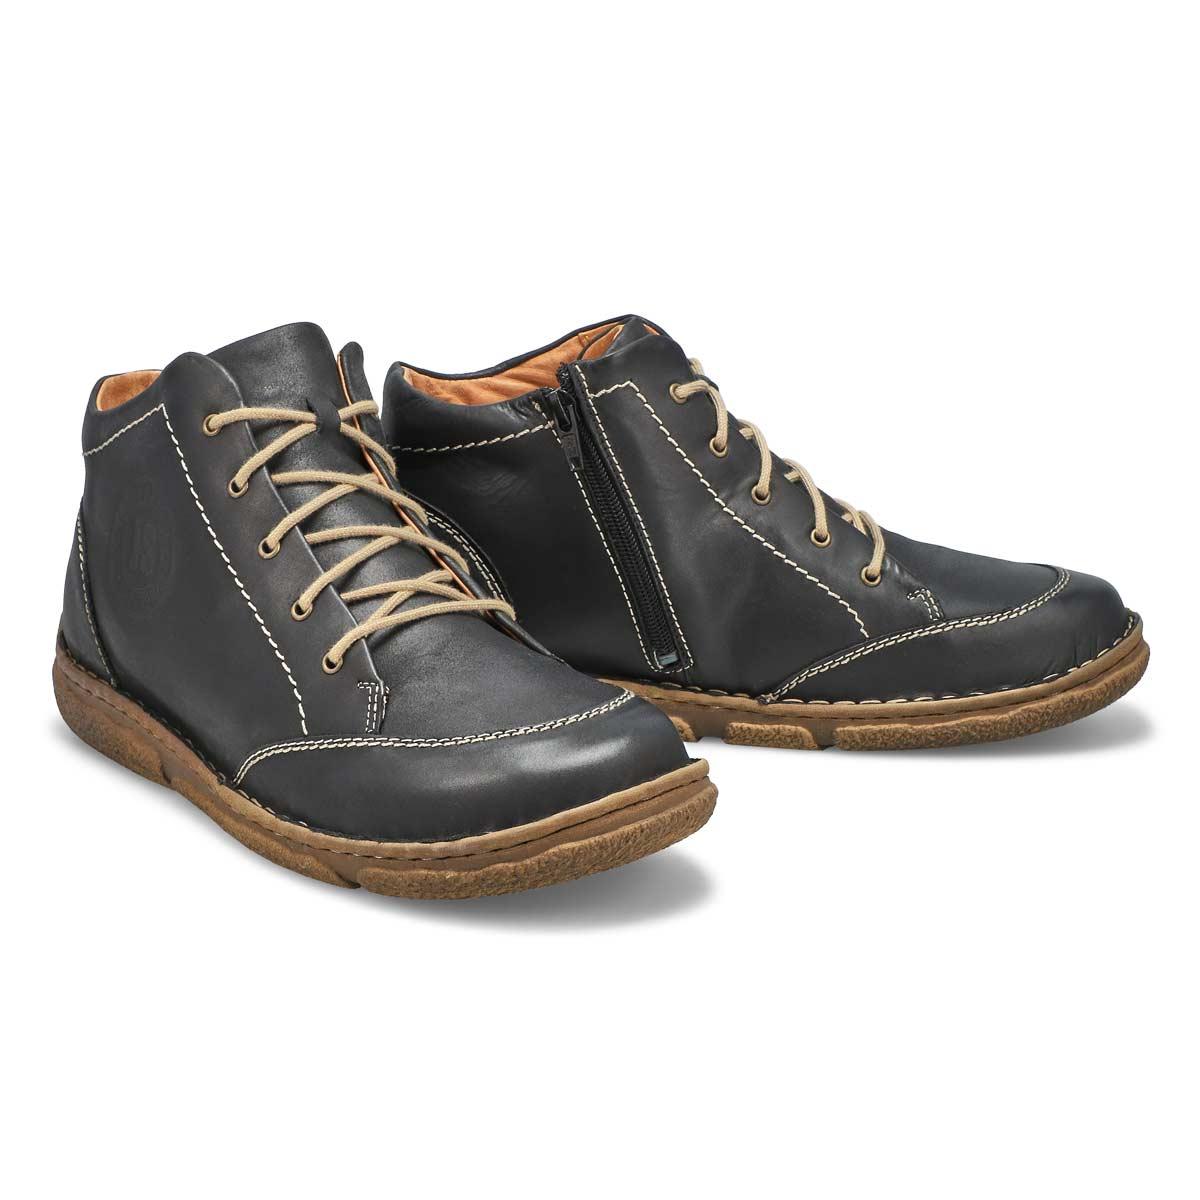 Women's Neele 01 Casual Ankle Boot - Black